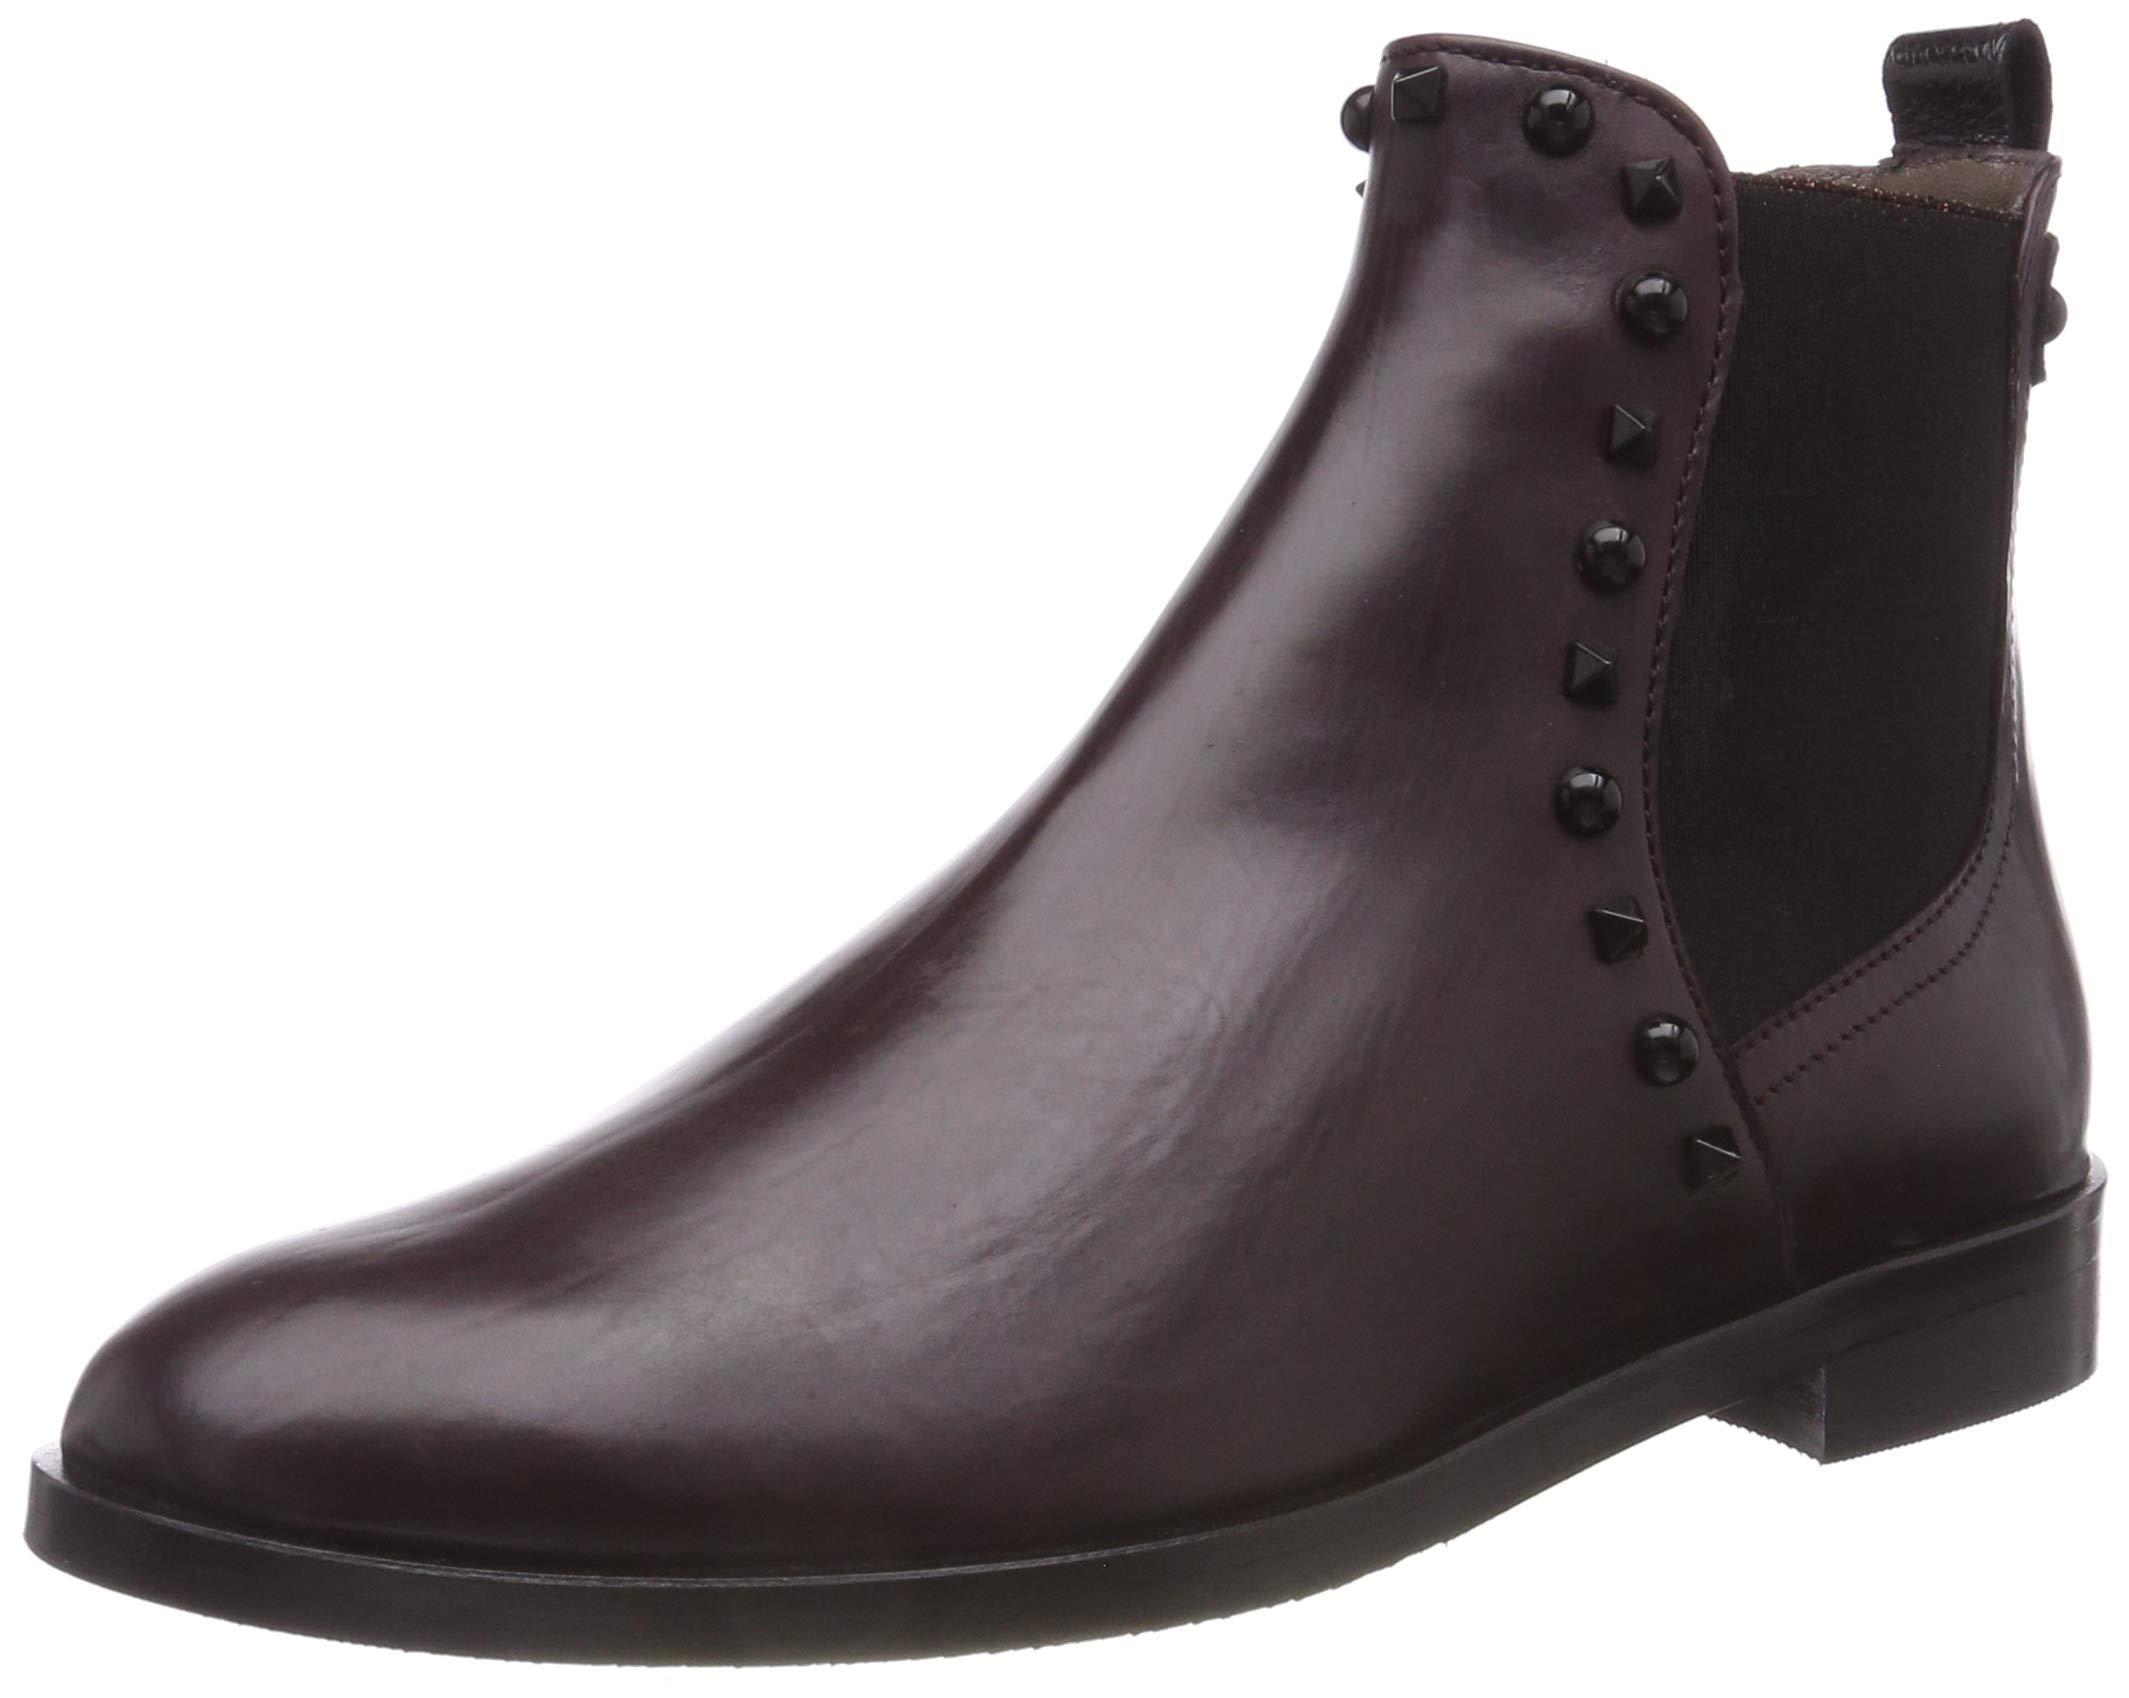 Maripé Eu 27333Chelsea 140 Mulberry Boots FemmeVioletdelice 7bg6yvYf